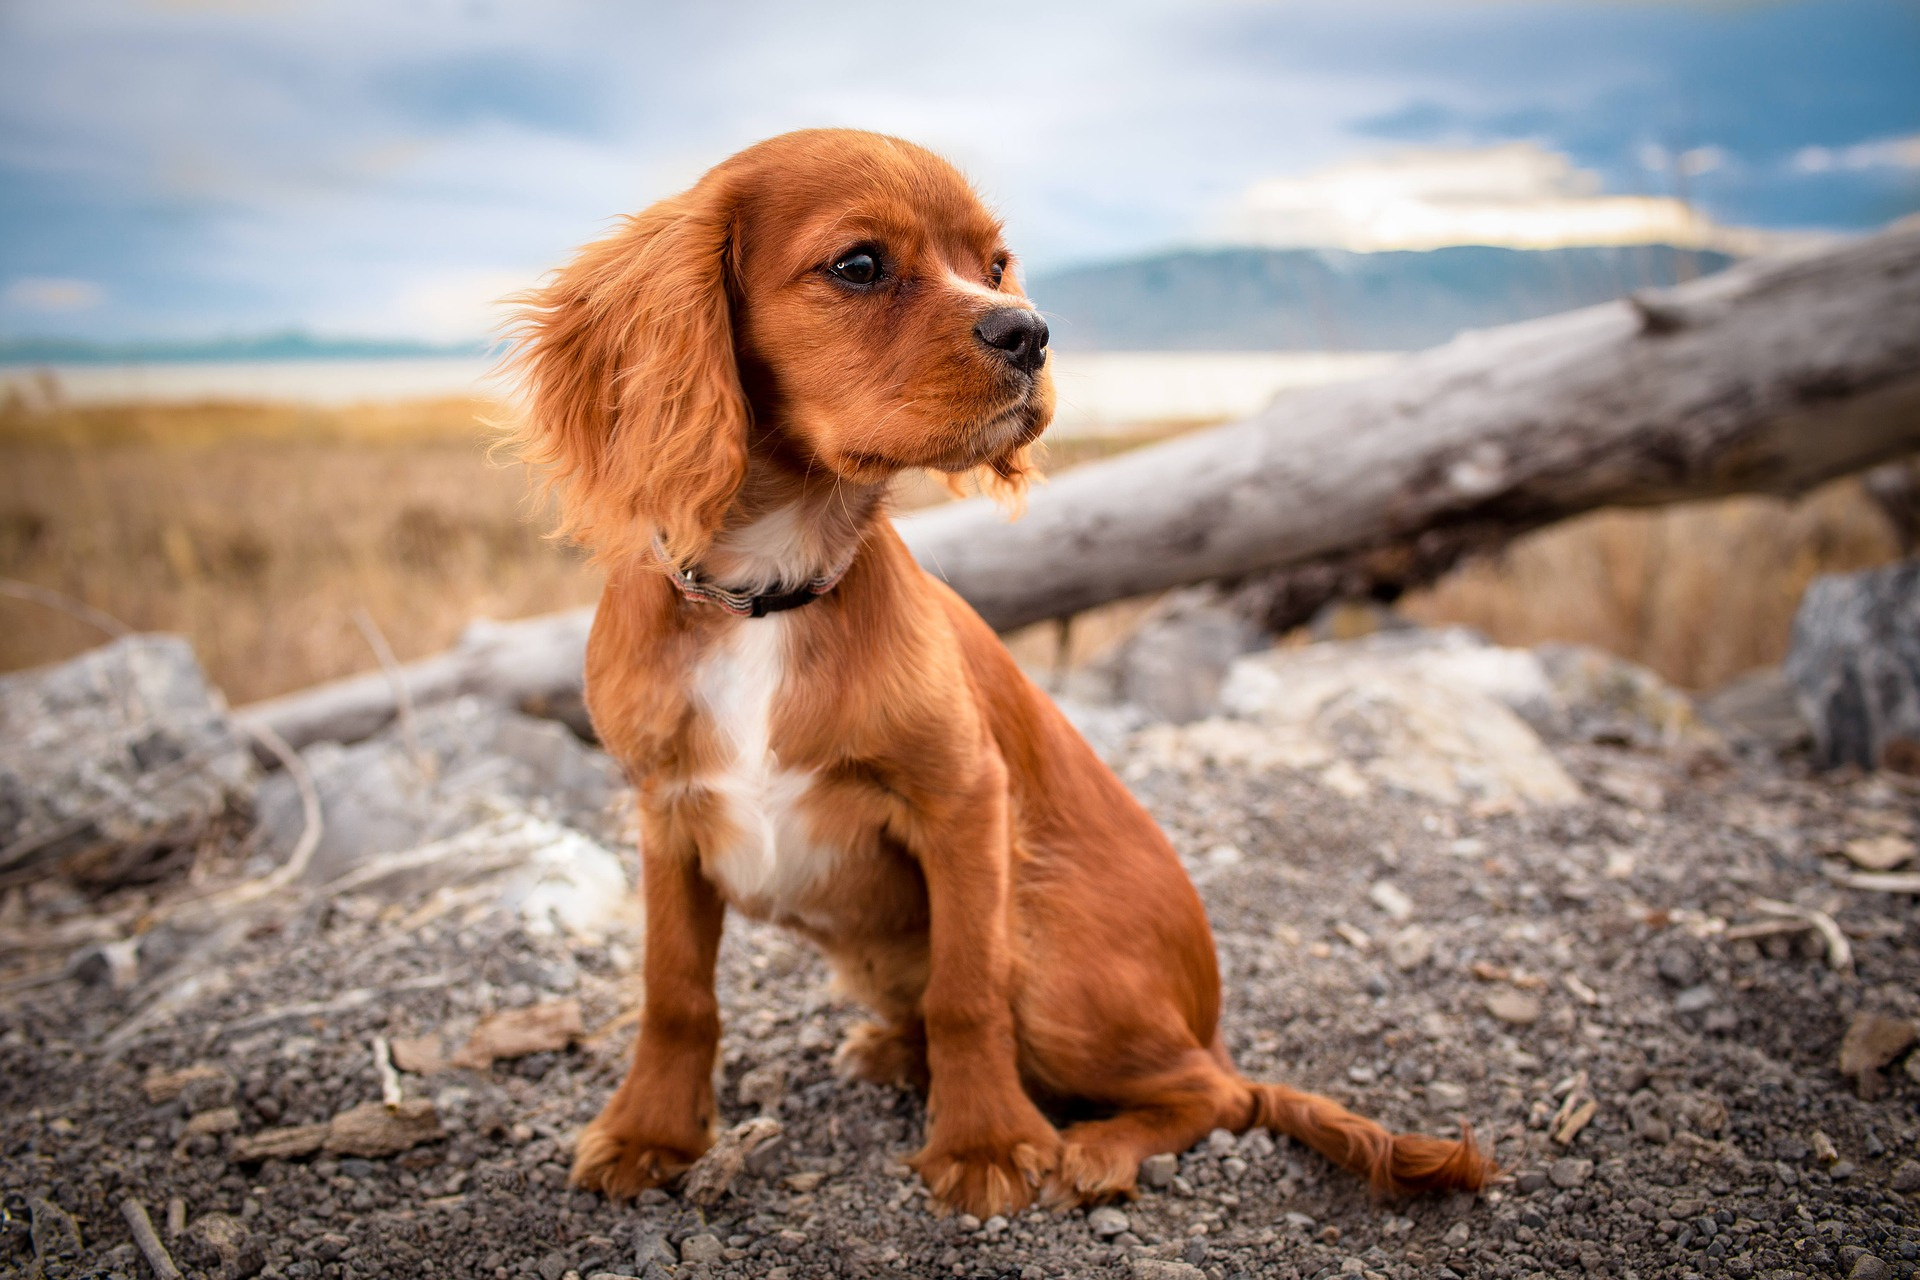 Warum fressen Hunde Gras? Irish Pure Blog